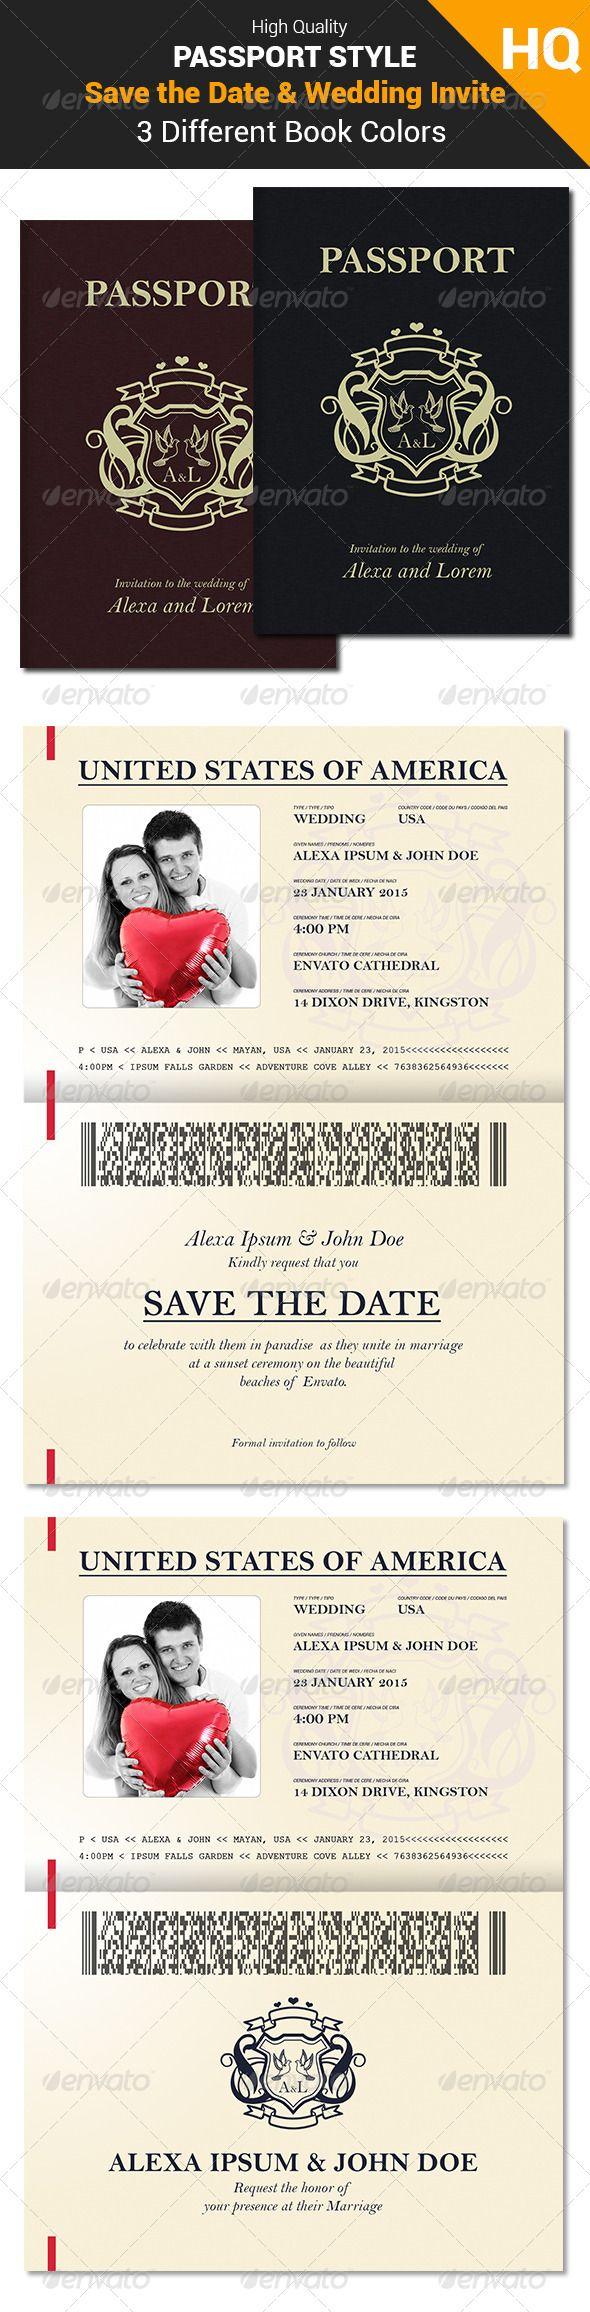 Passport Style Wedding Invitation Save the